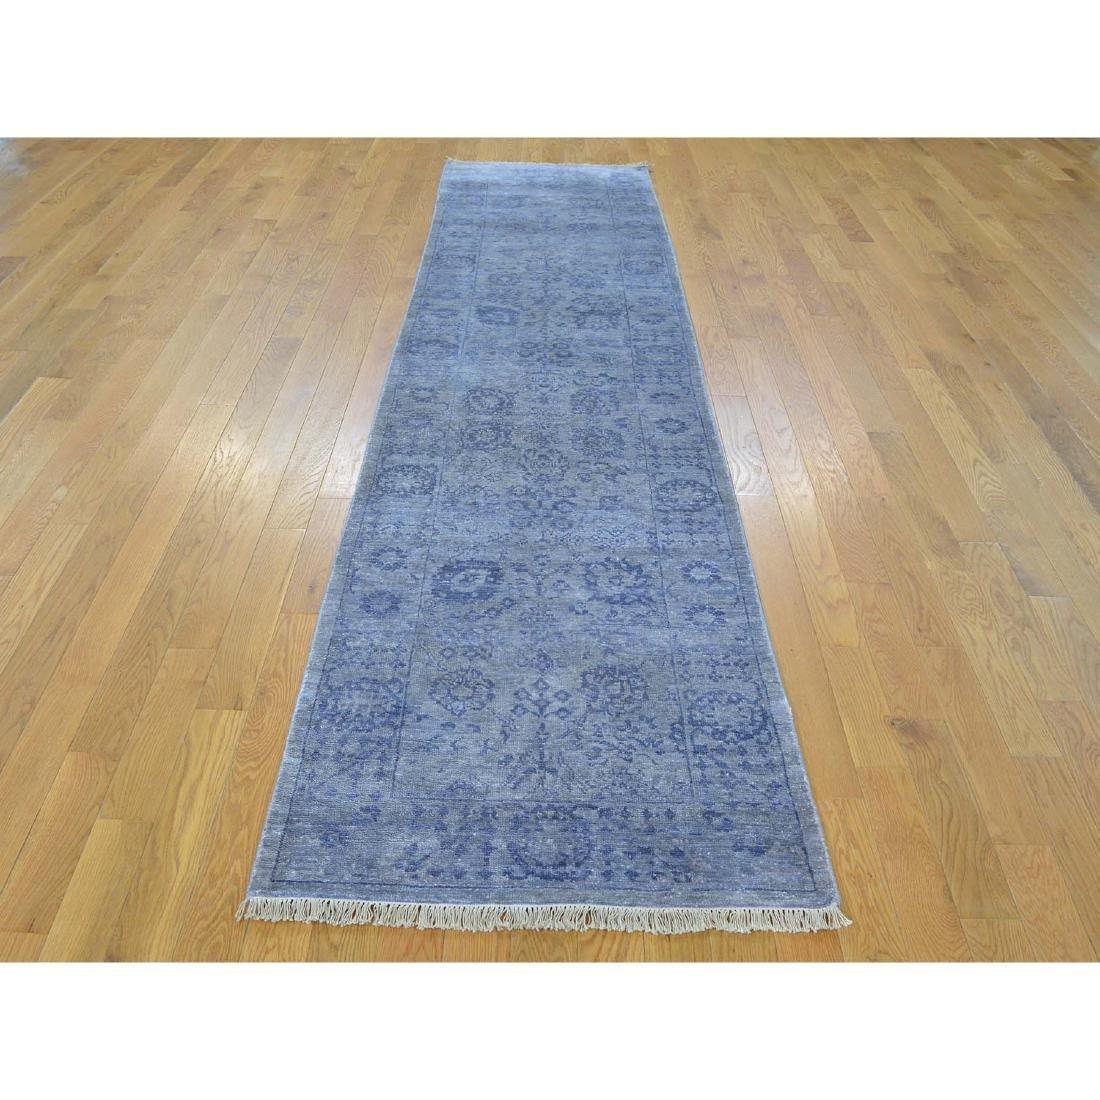 Runner Wool and Silk Tone on Tone Tabriz Handmade Rug - 2